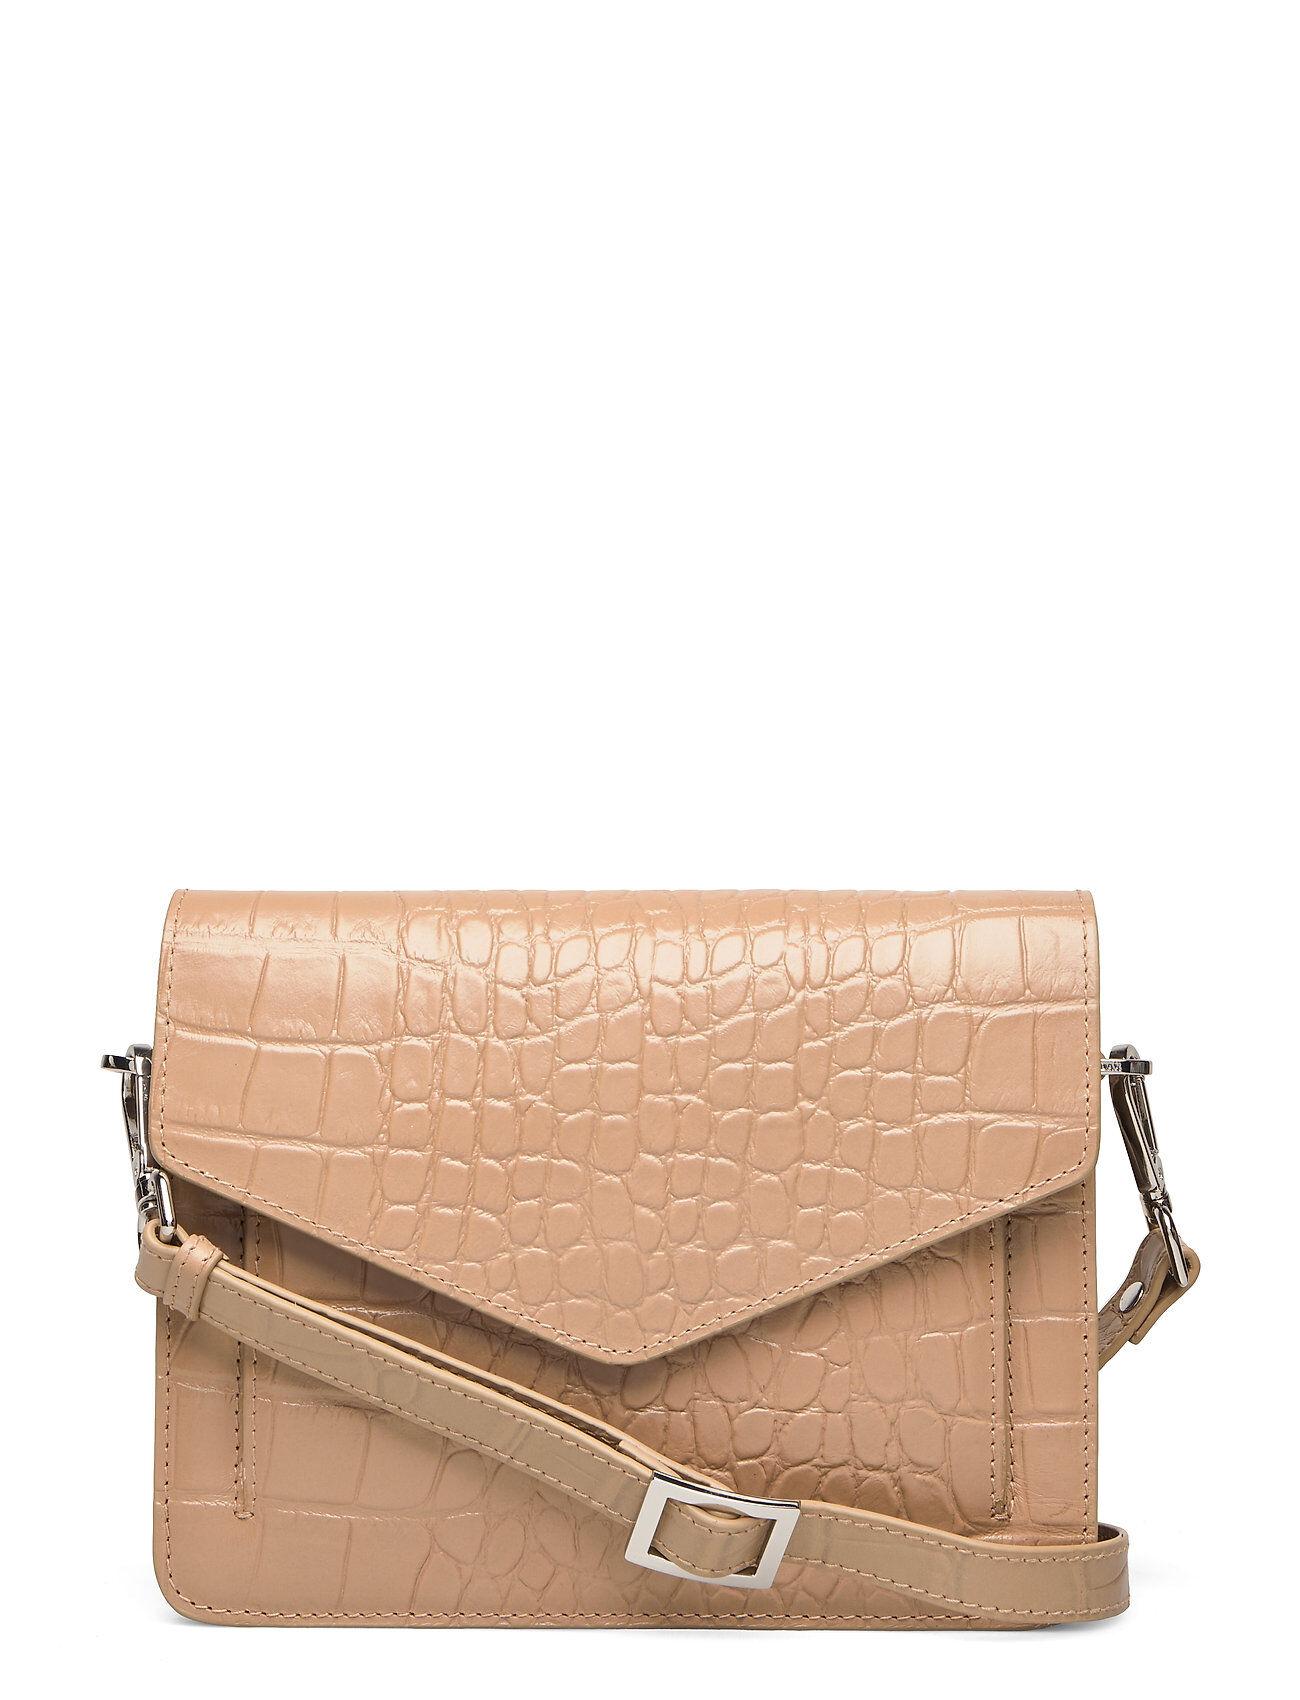 Adax Teramo Shoulder Bag Pearl Bags Small Shoulder Bags - Crossbody Bags Beige Adax